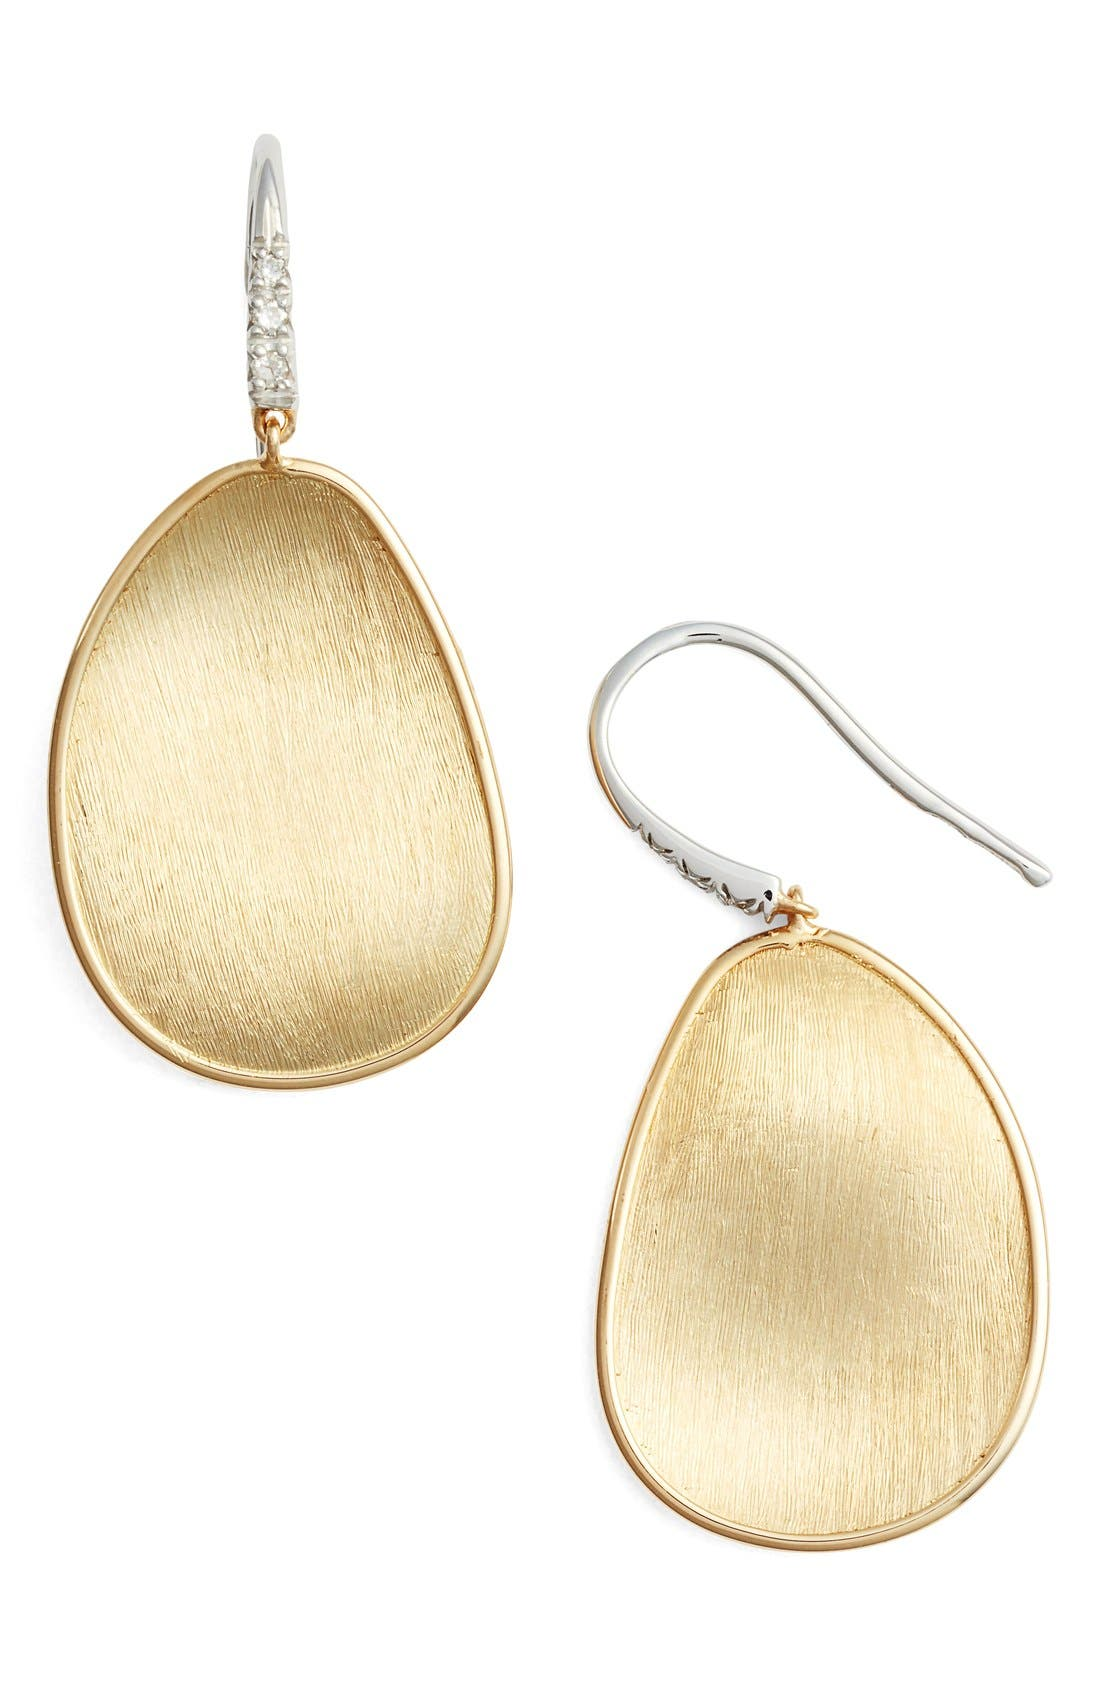 Lunaria Diamond & Gold Drop Earrings,                             Main thumbnail 1, color,                             YELLOW GOLD